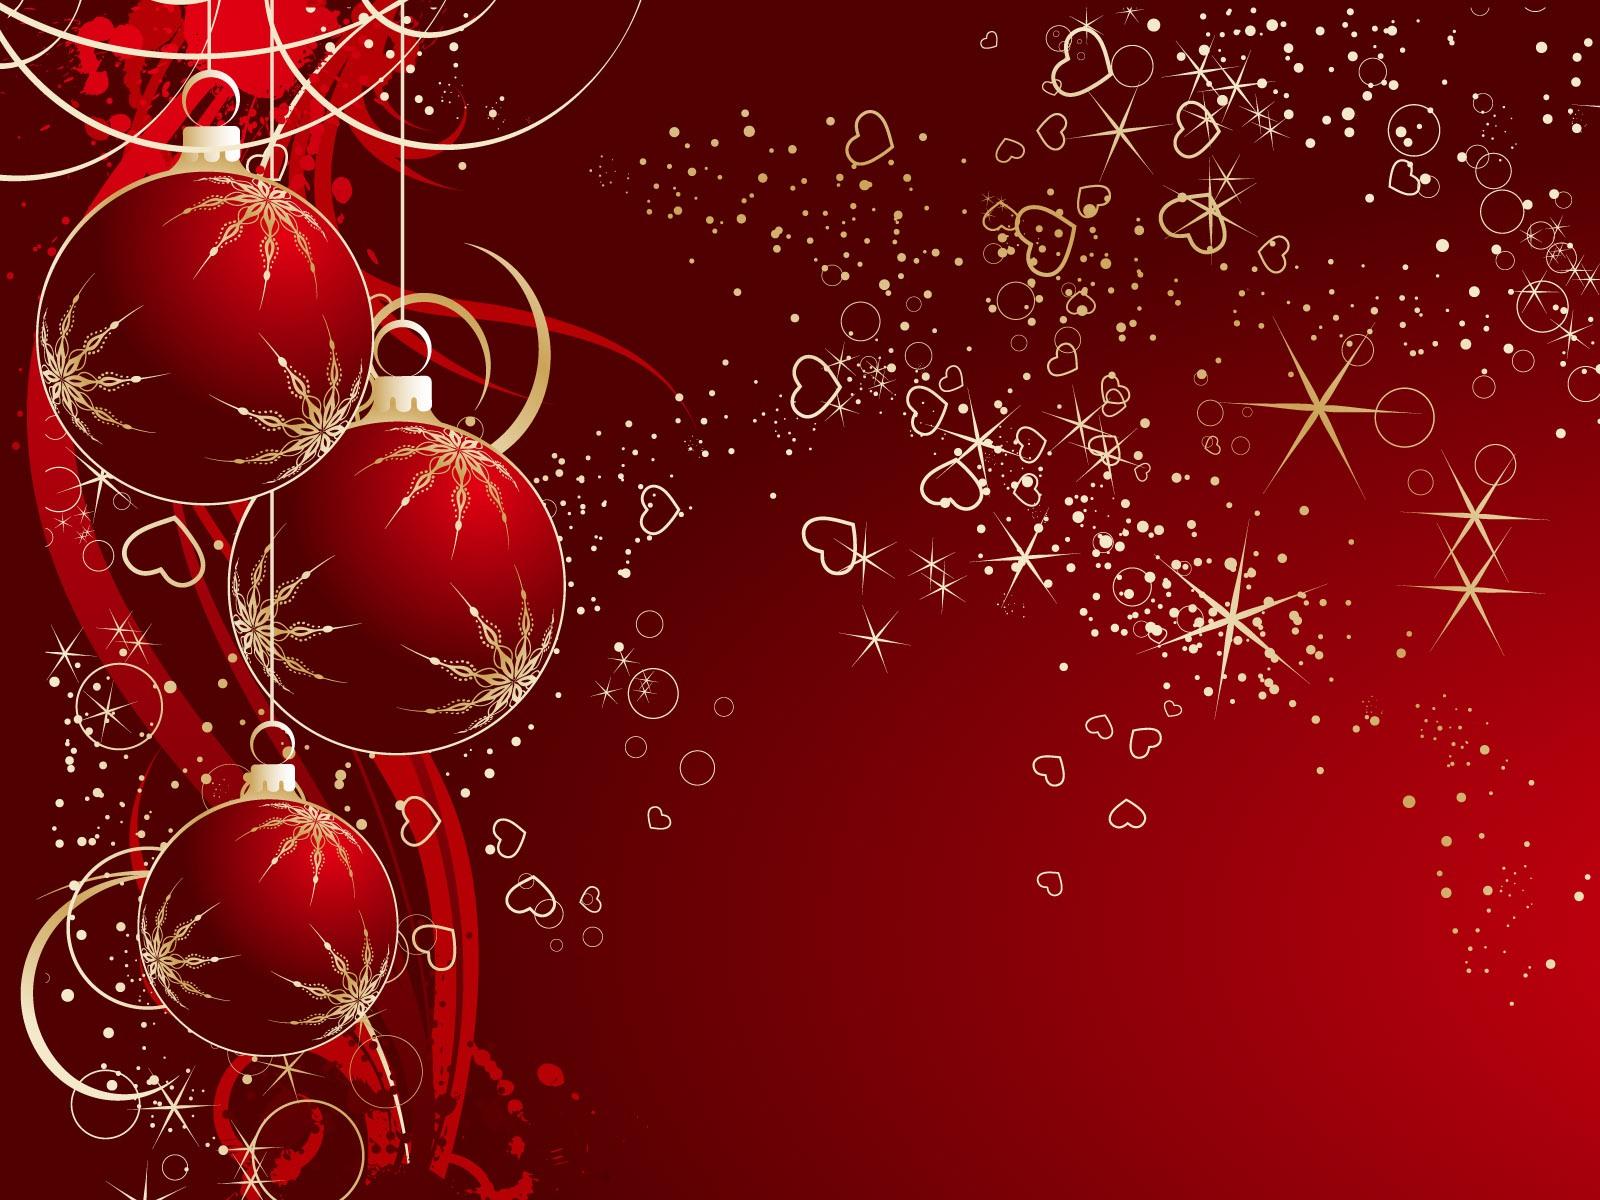 http://1.bp.blogspot.com/_LkX4kGHBNuk/TRMVJ2a5s_I/AAAAAAAAA-0/8V2ZlG0xv7Y/s1600/christmas-wallpaper-i.jpg